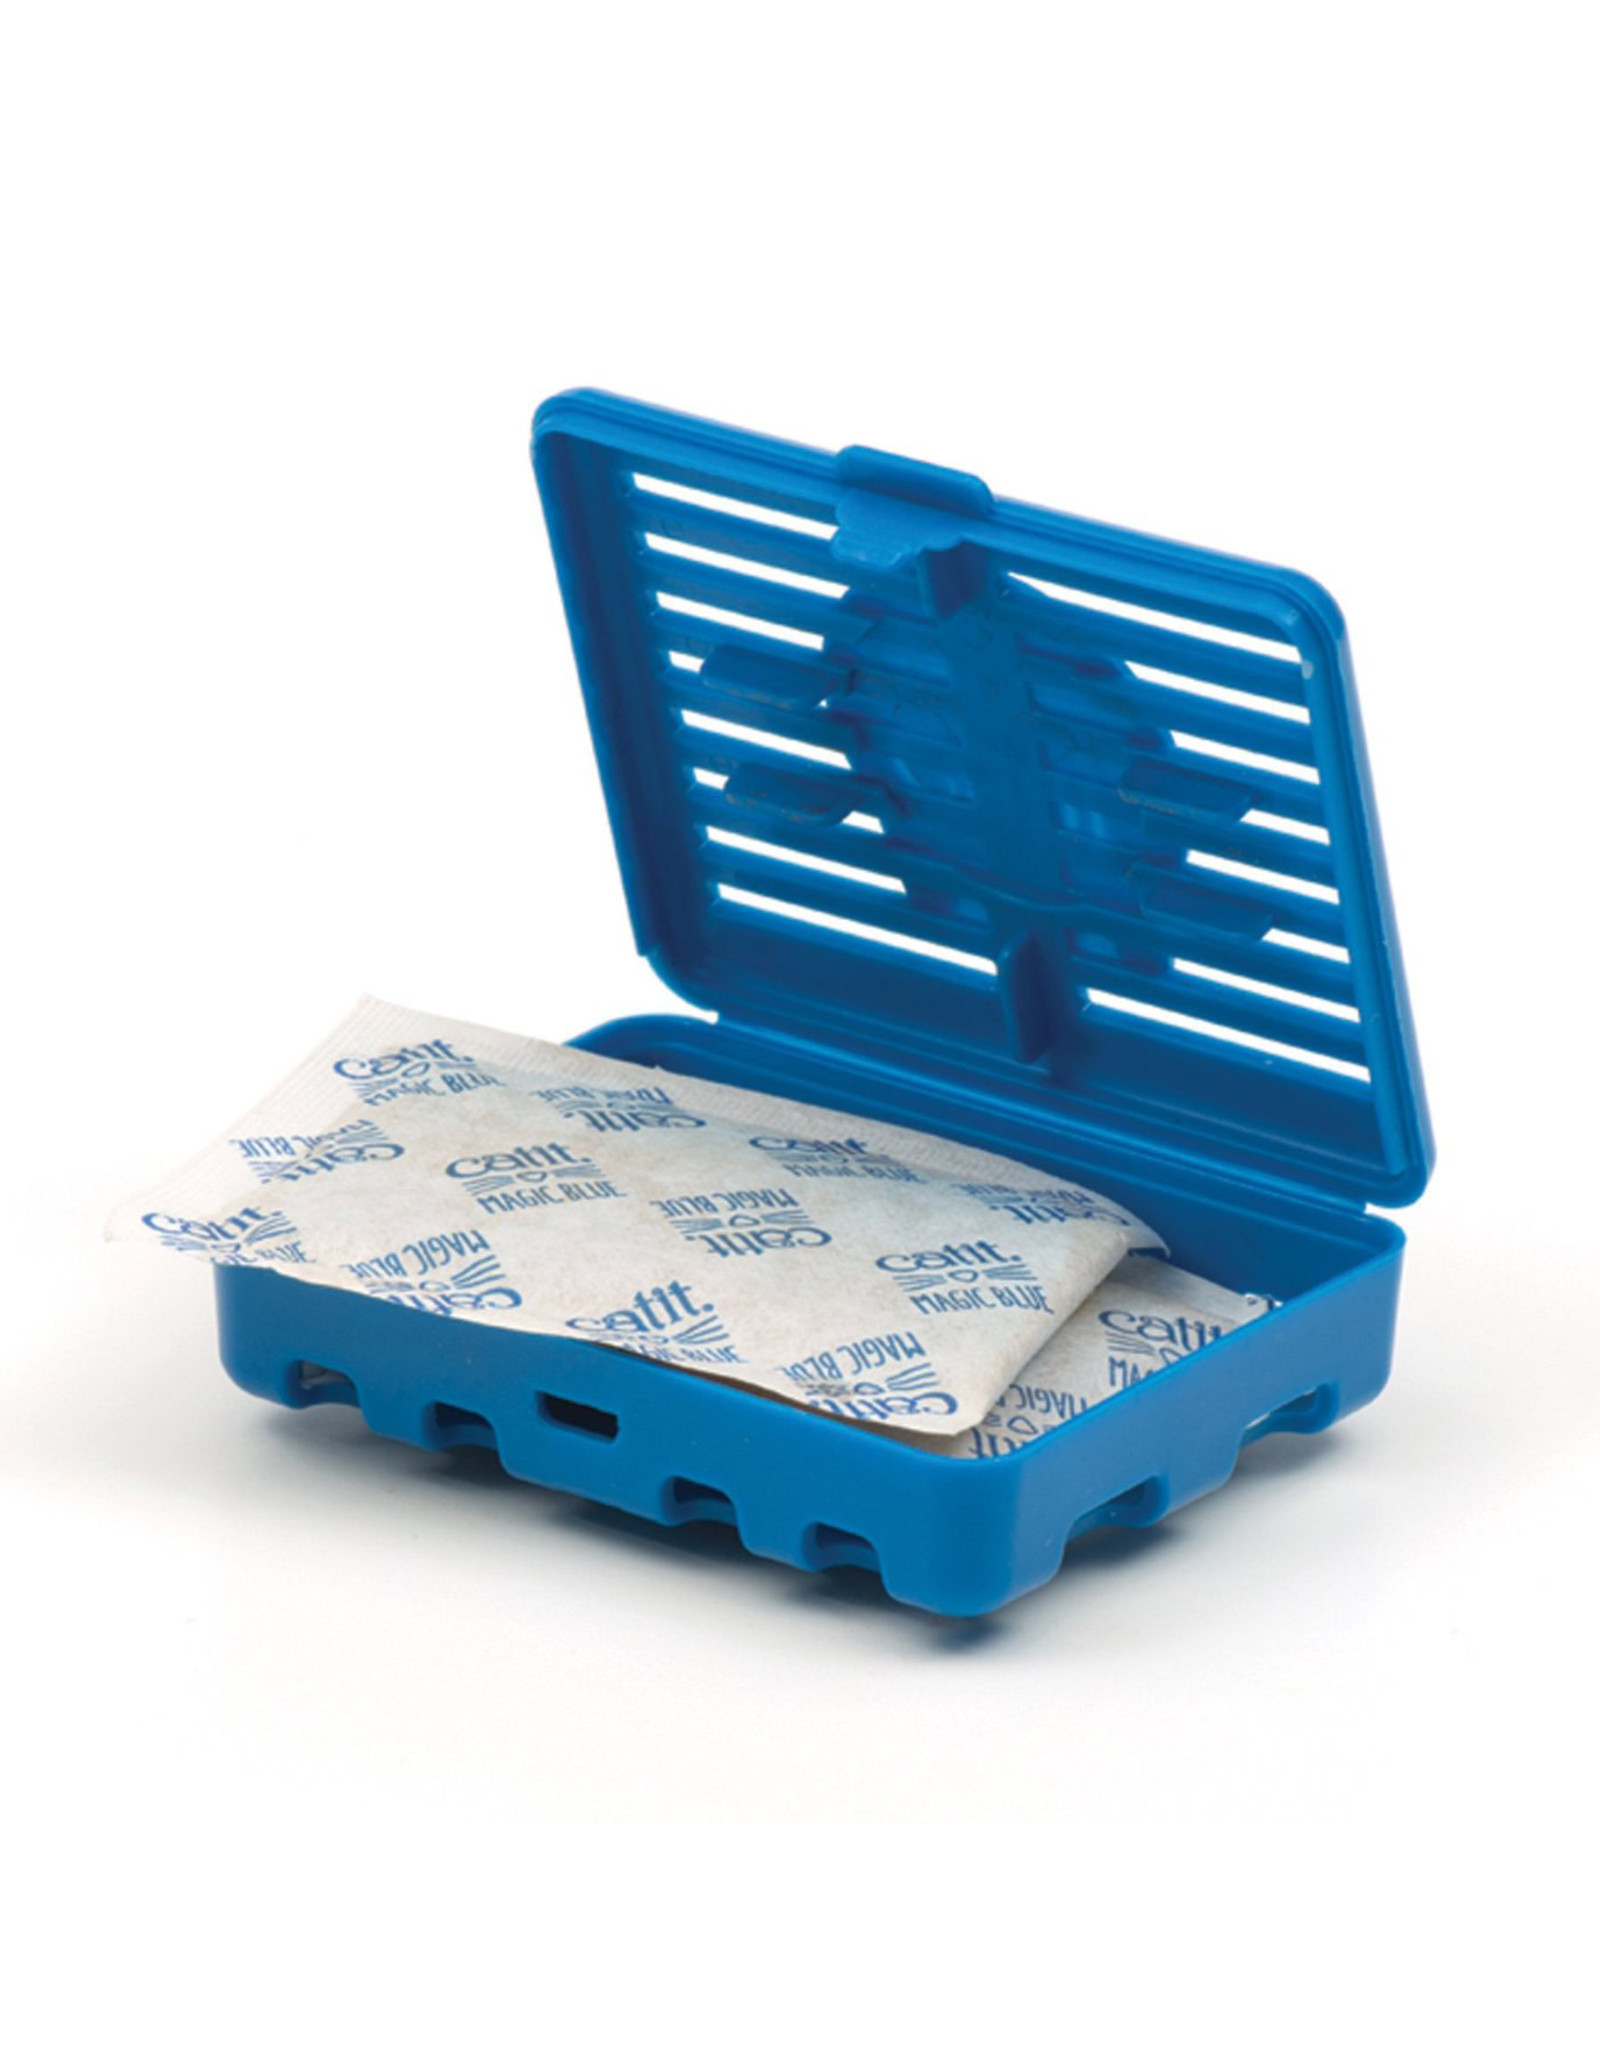 CA - Catit Catit Magic Blue Cartridge Set